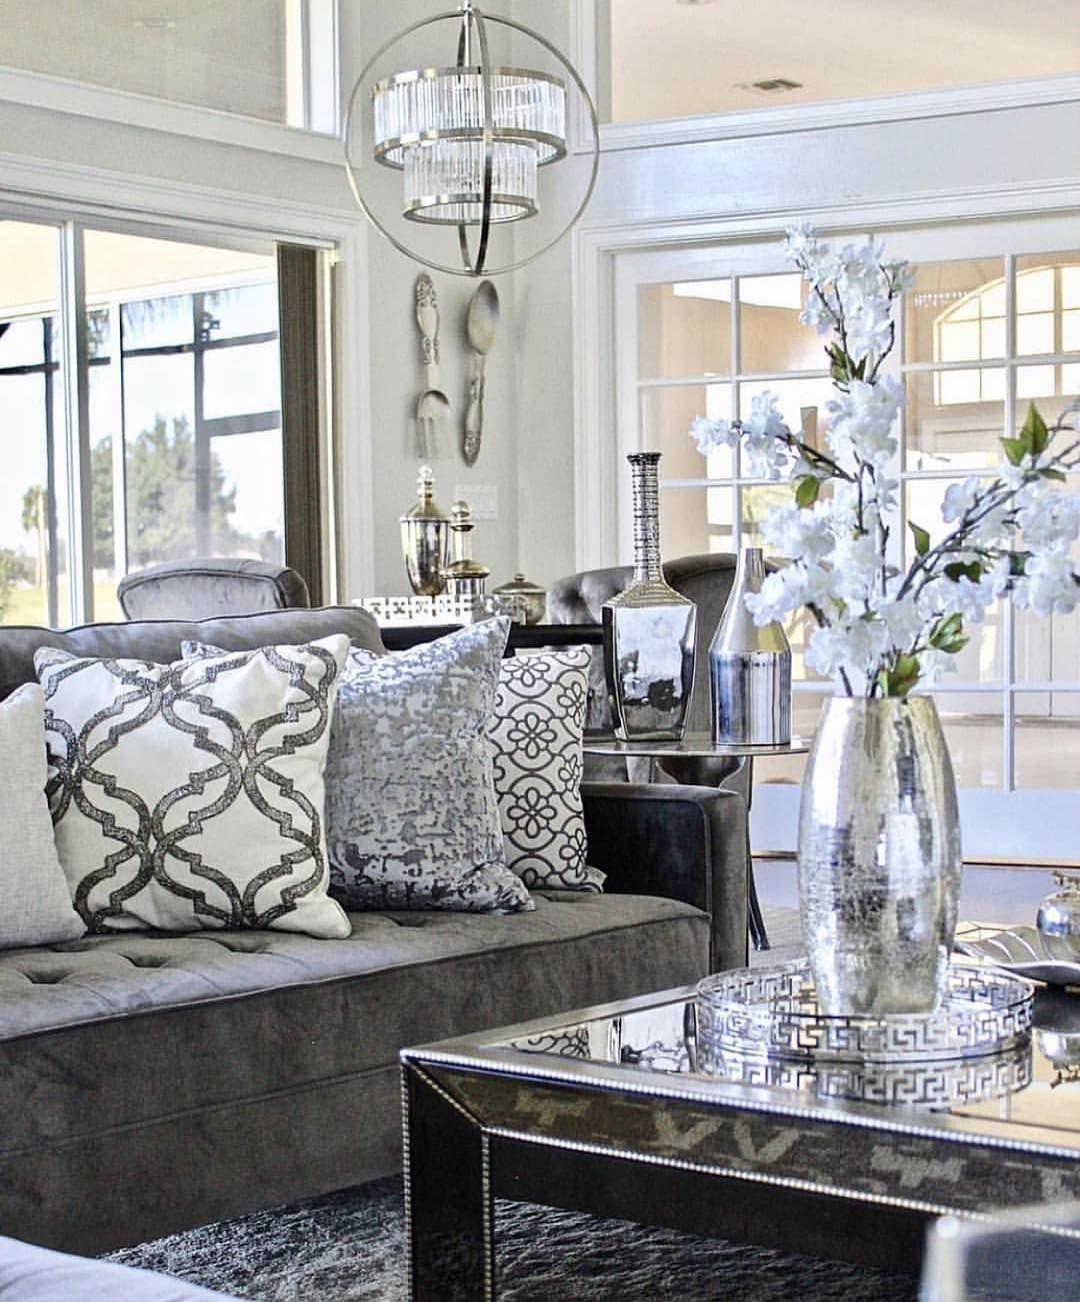 Marvelous 11 Best Luxury Interior Designers In The World Home Decor Cheap Home Decor Interior Design Career